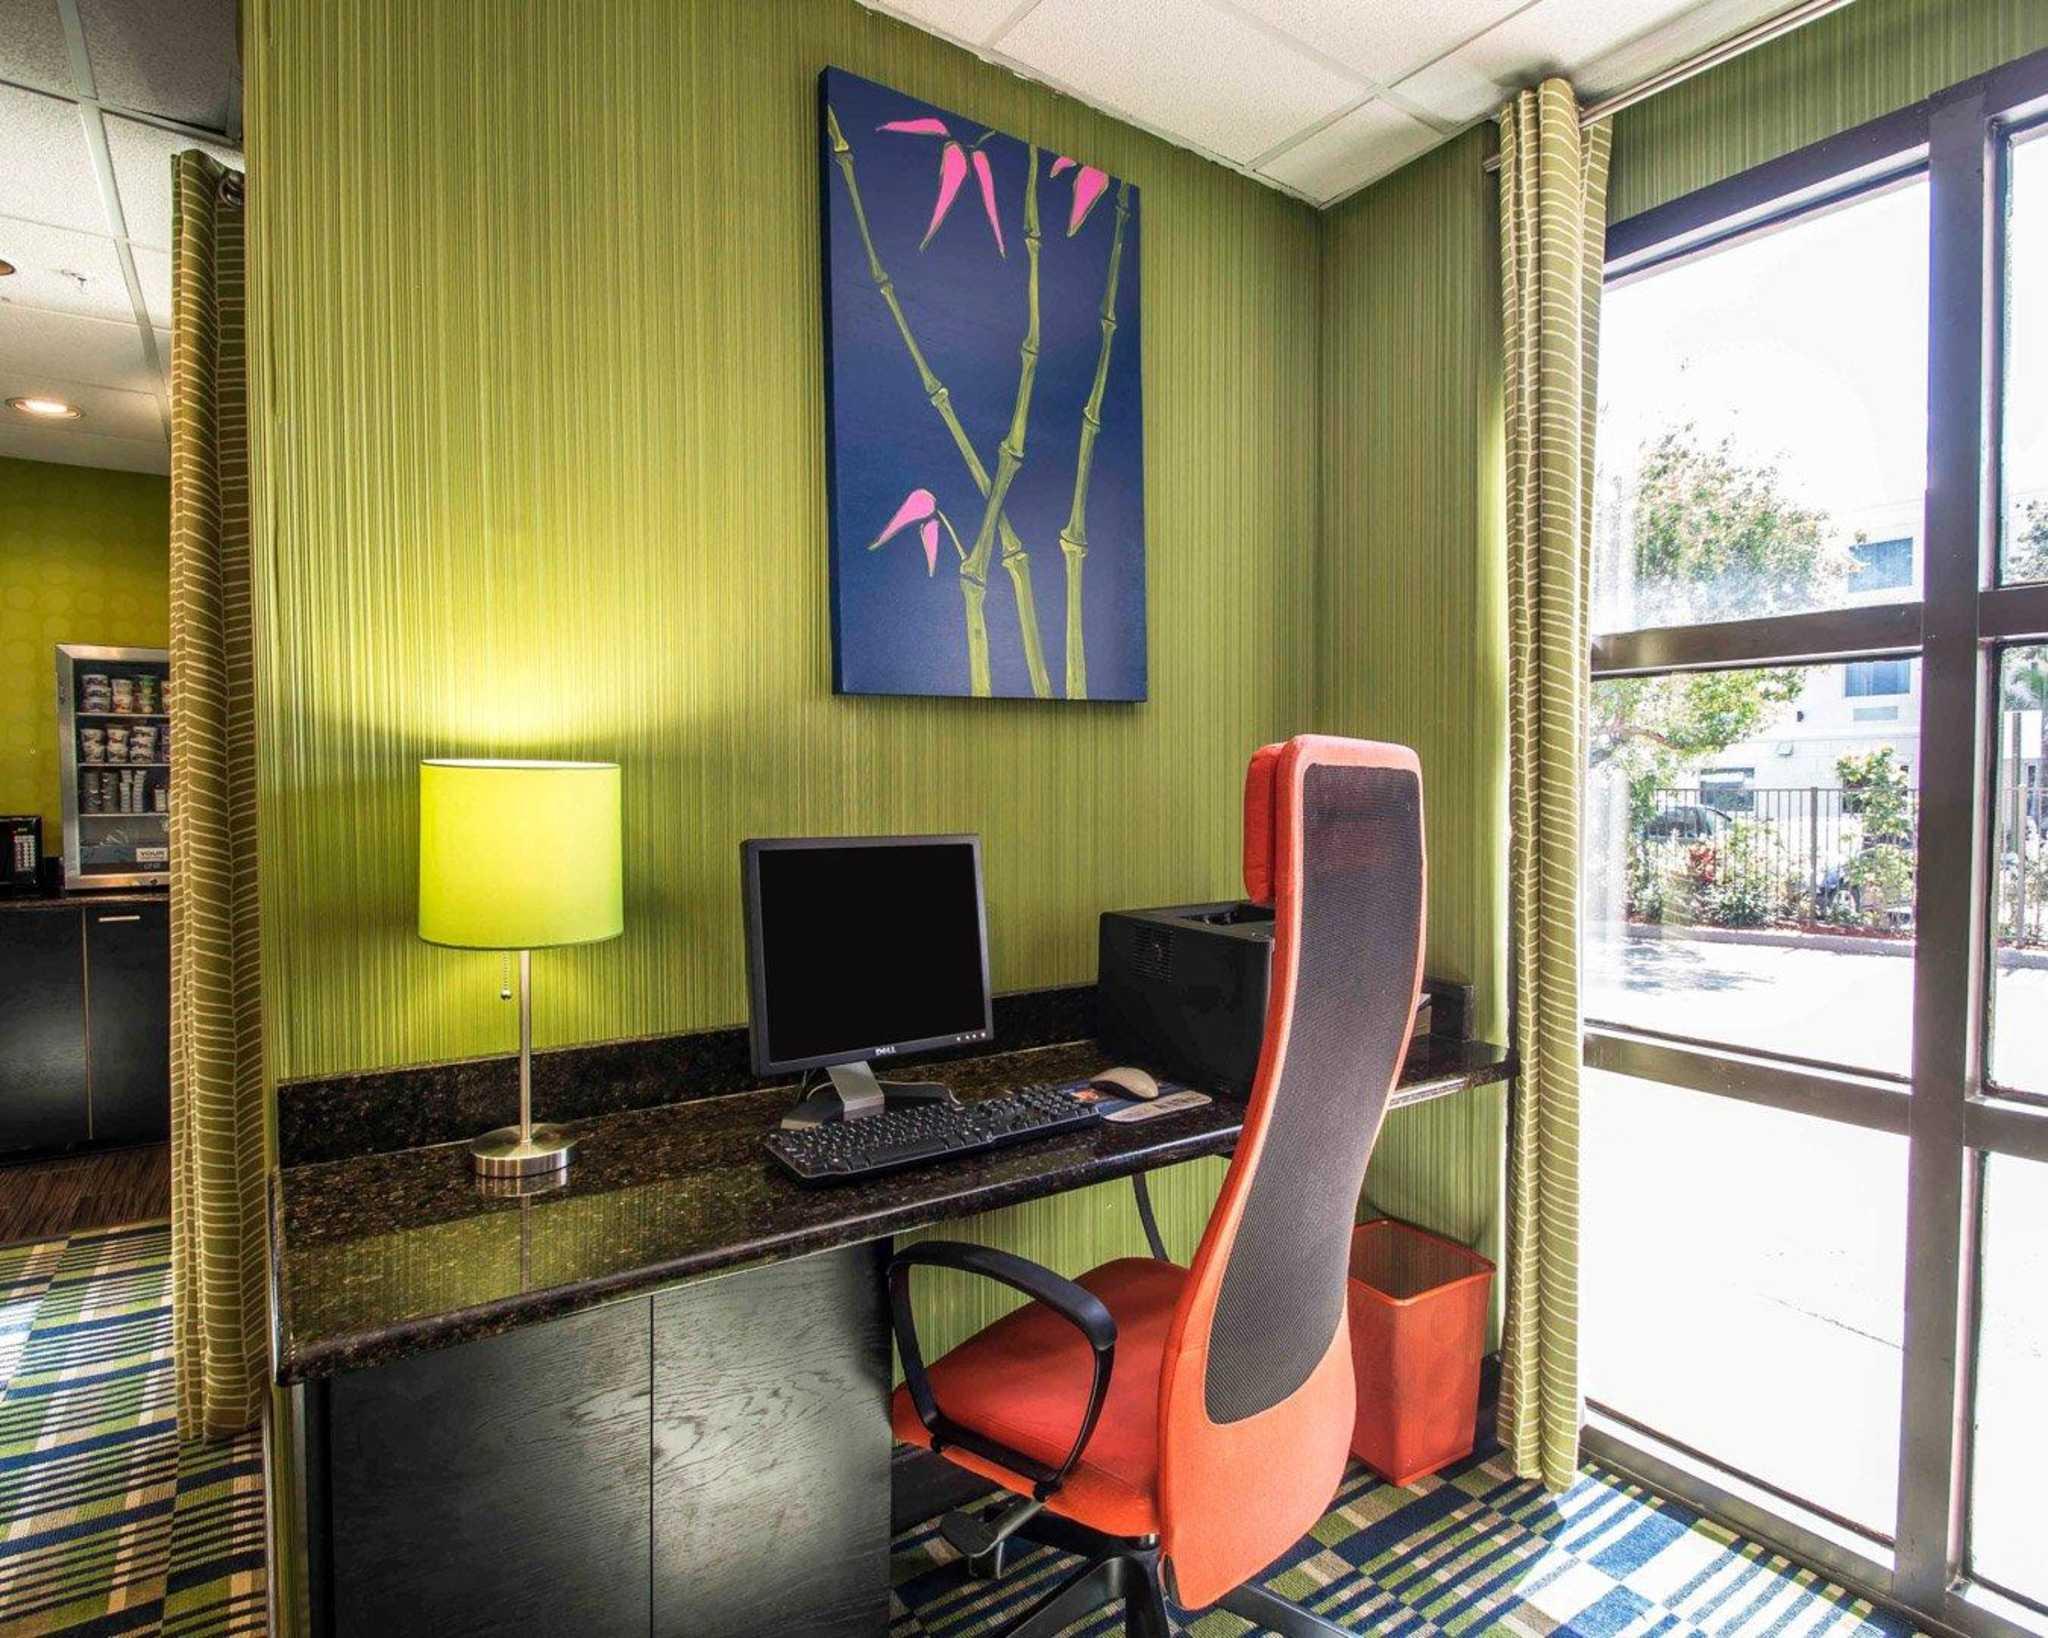 Comfort Inn & Suites Lantana - West Palm Beach South image 34